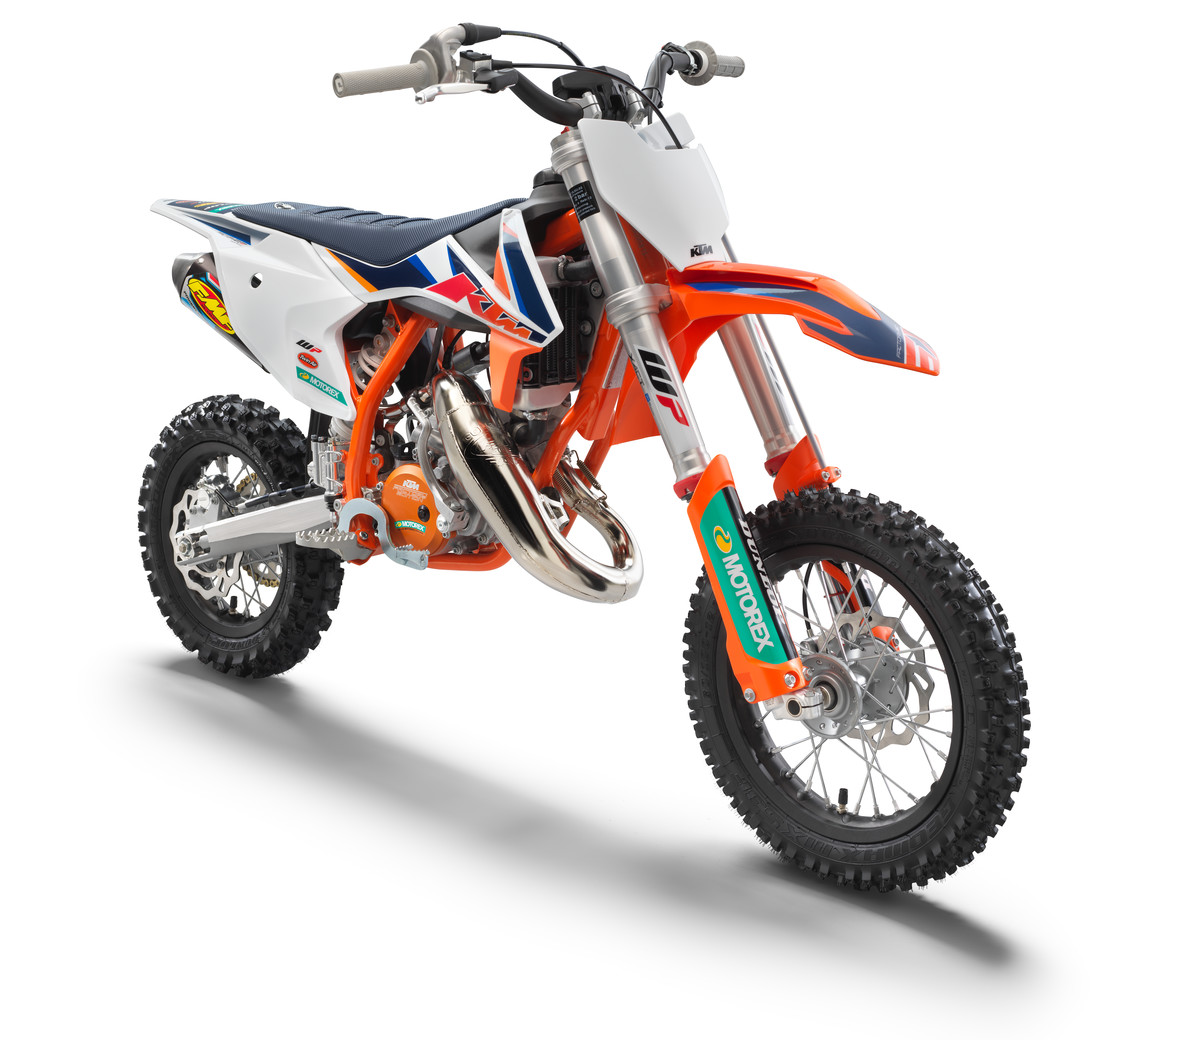 KTM 50 SX Factory Edition 2022